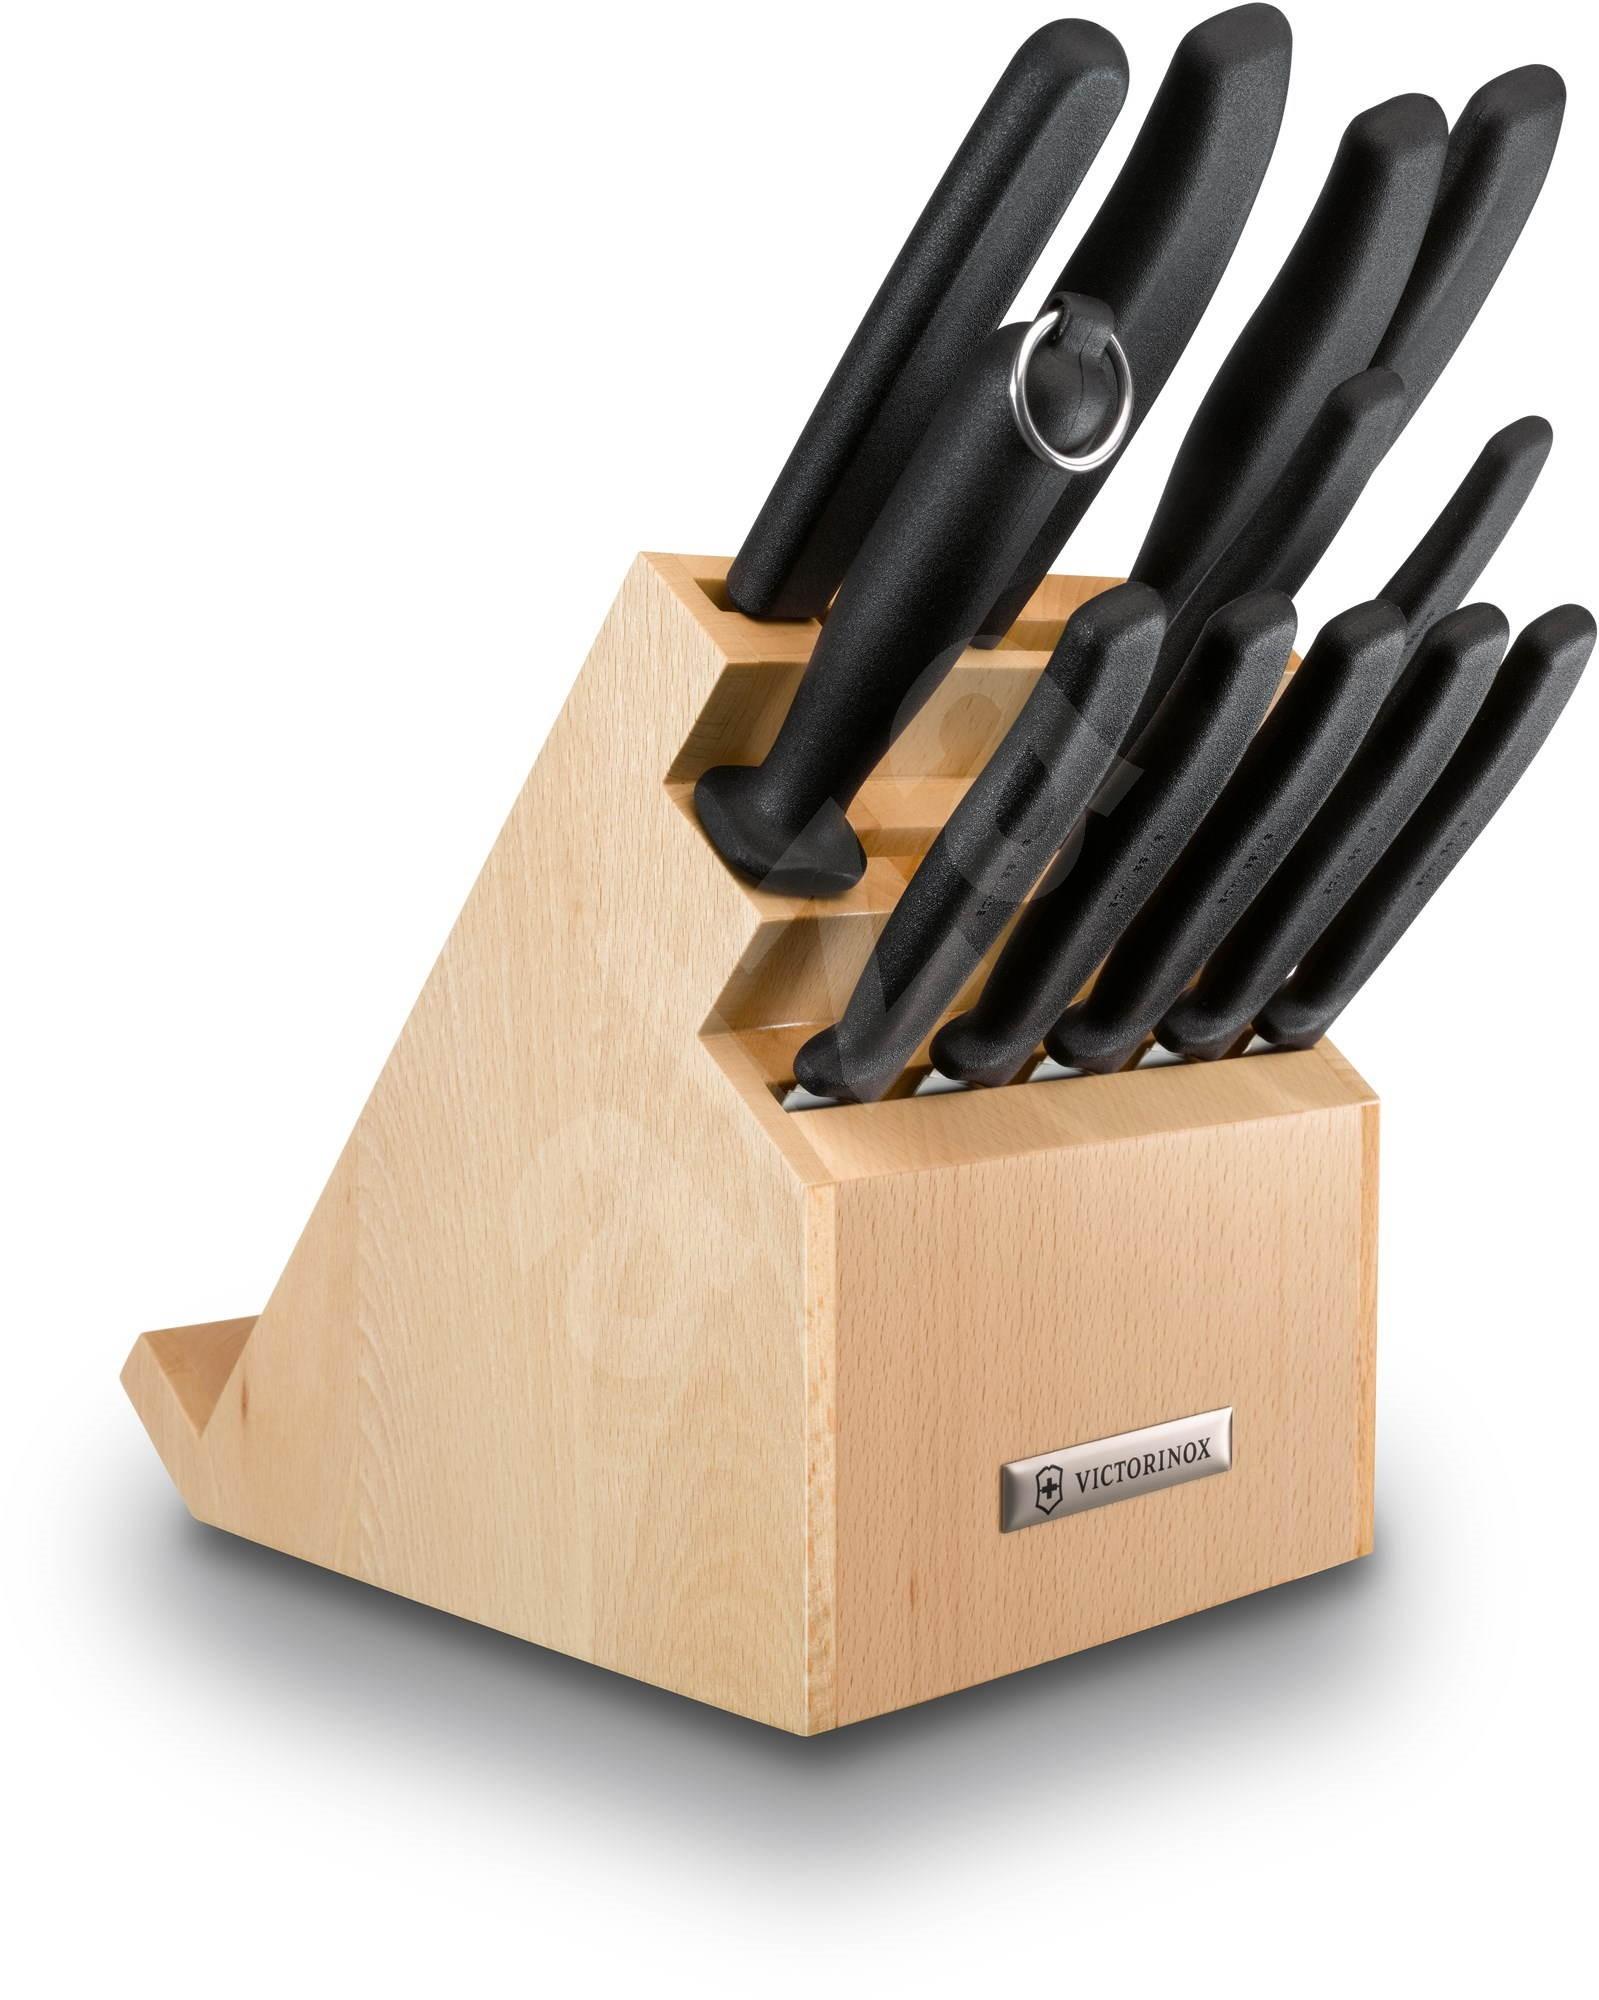 victorinox block with knives for chefs digital knife set. Black Bedroom Furniture Sets. Home Design Ideas